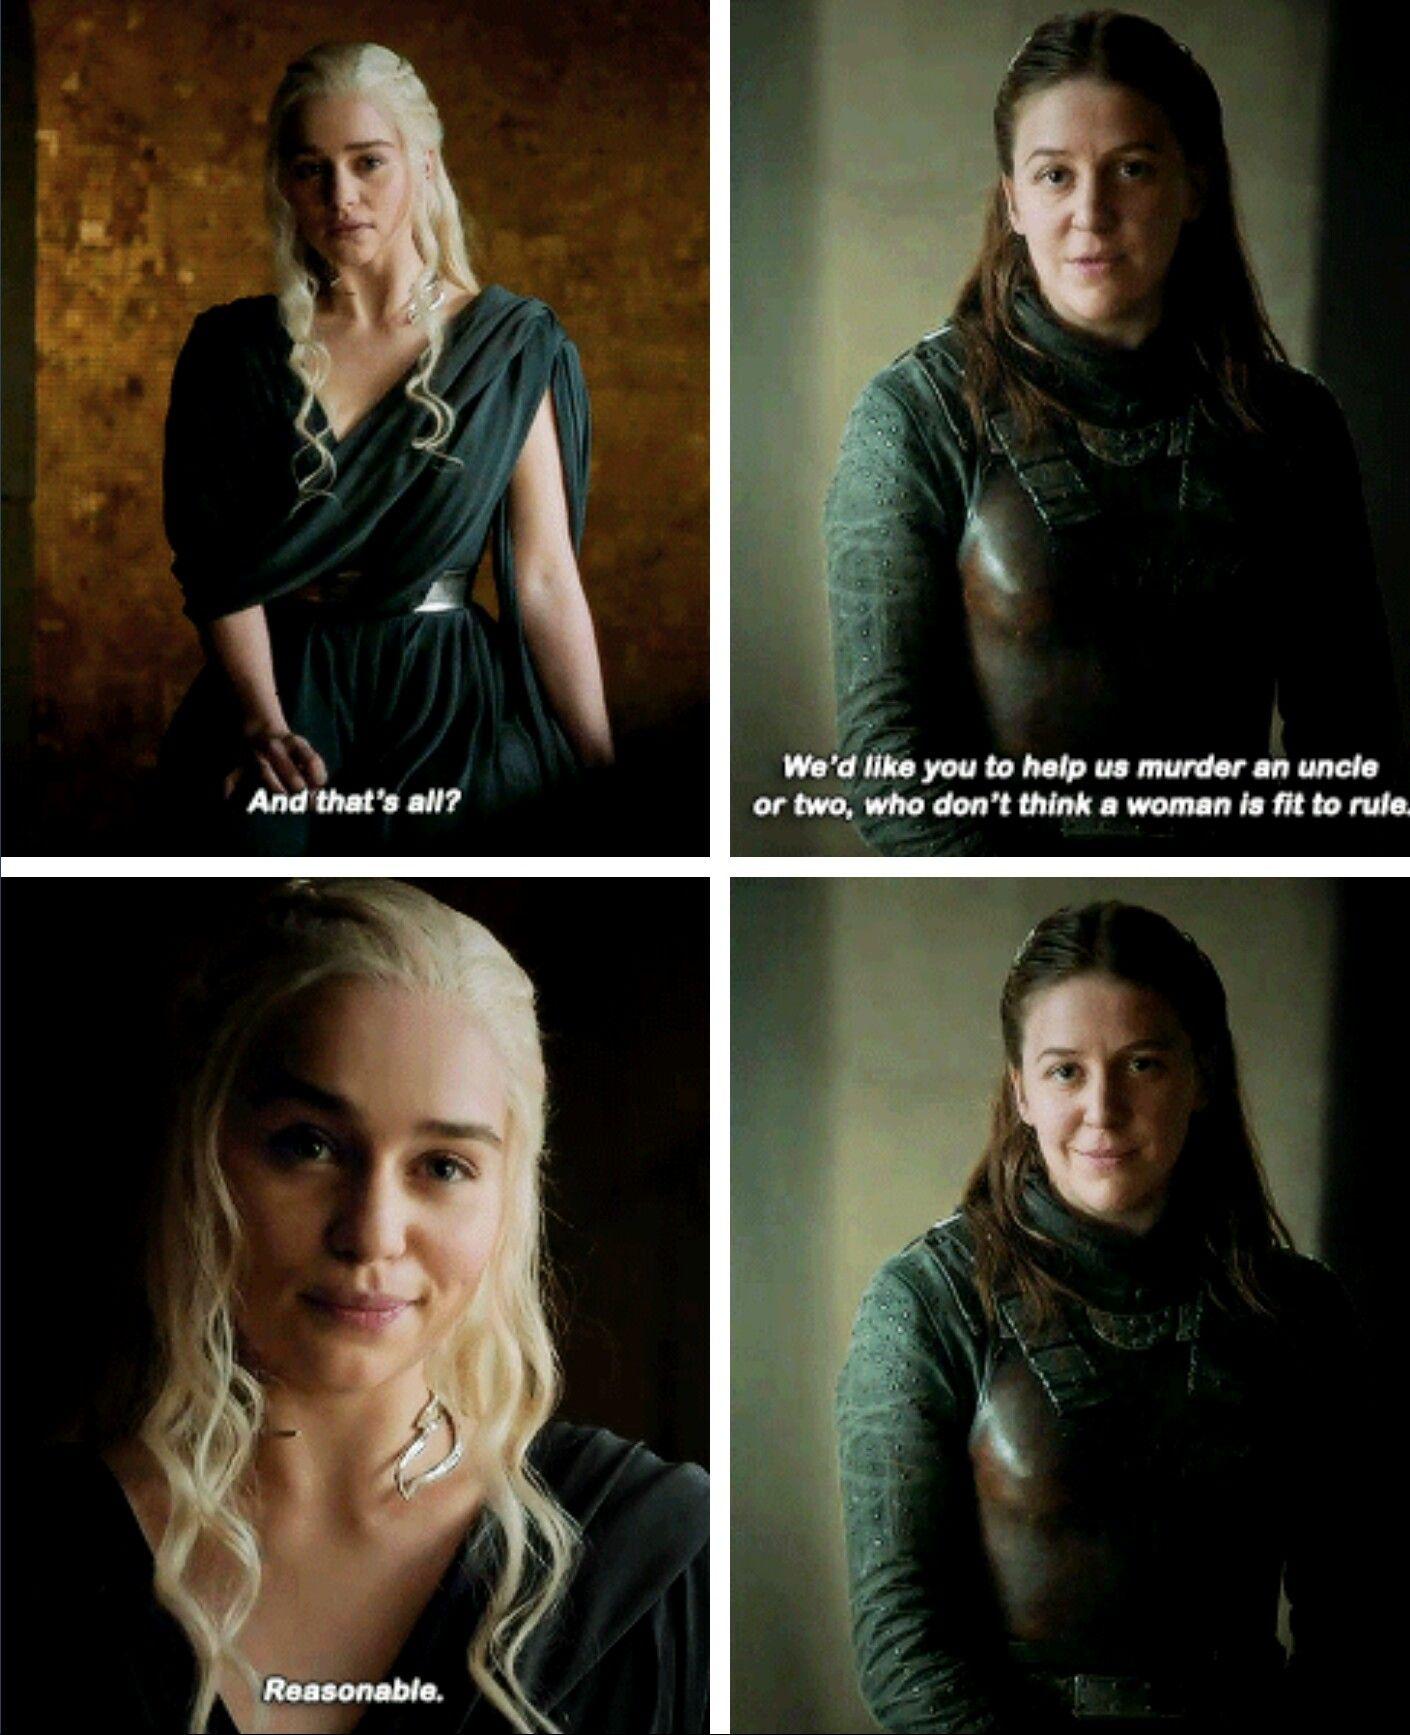 Daenerys Targaryen U0026 Yara Greyjoy, Game Of Thrones Season 6 Quotes Funny  Humour Meme